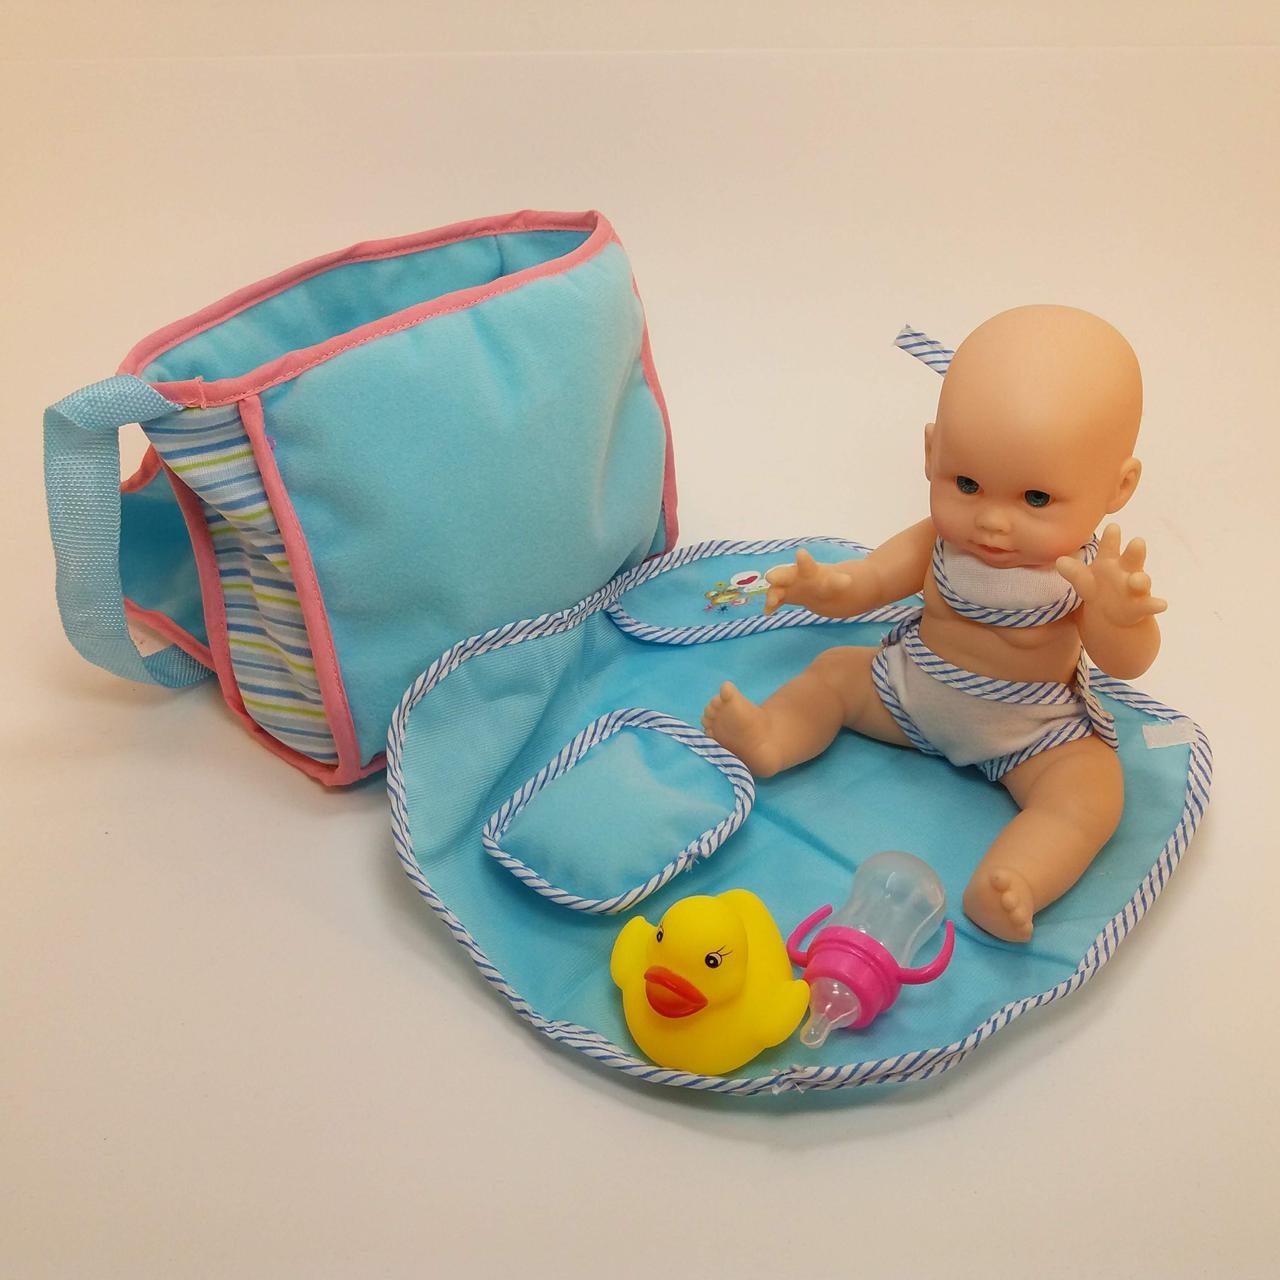 Кукла пупс со звуковыми эффектами и аксессуарами 0825I-13